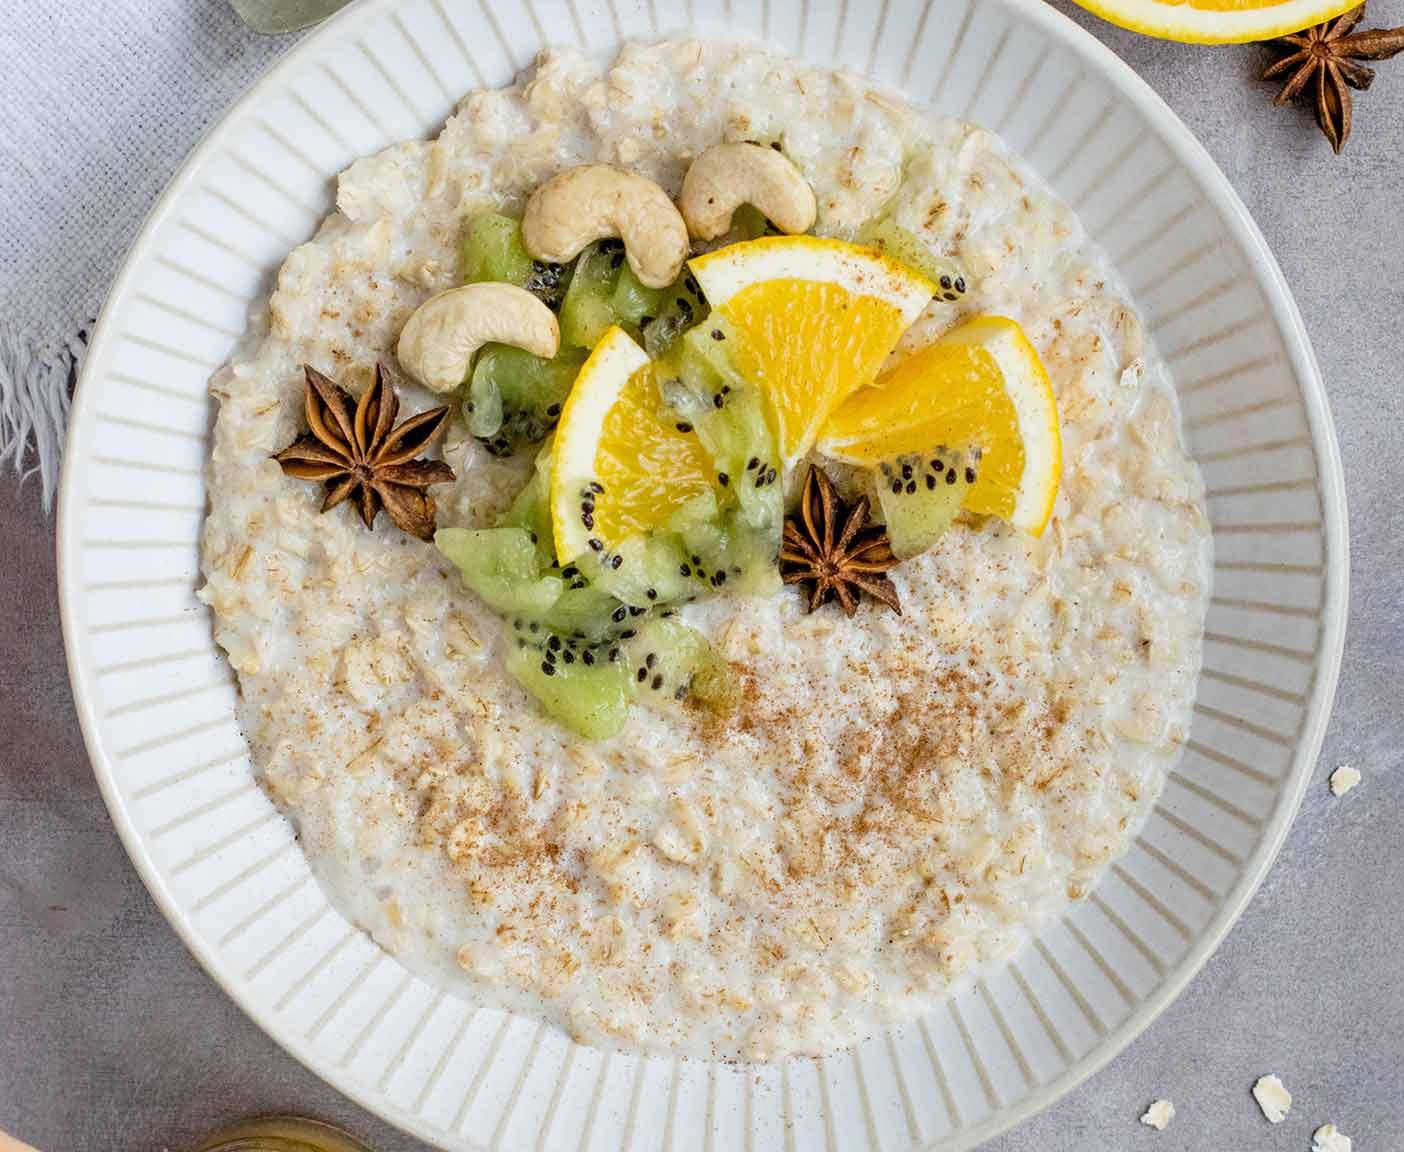 campingkueche-rezepte-oat-meal-porridge-haferbrei-fruehstueck